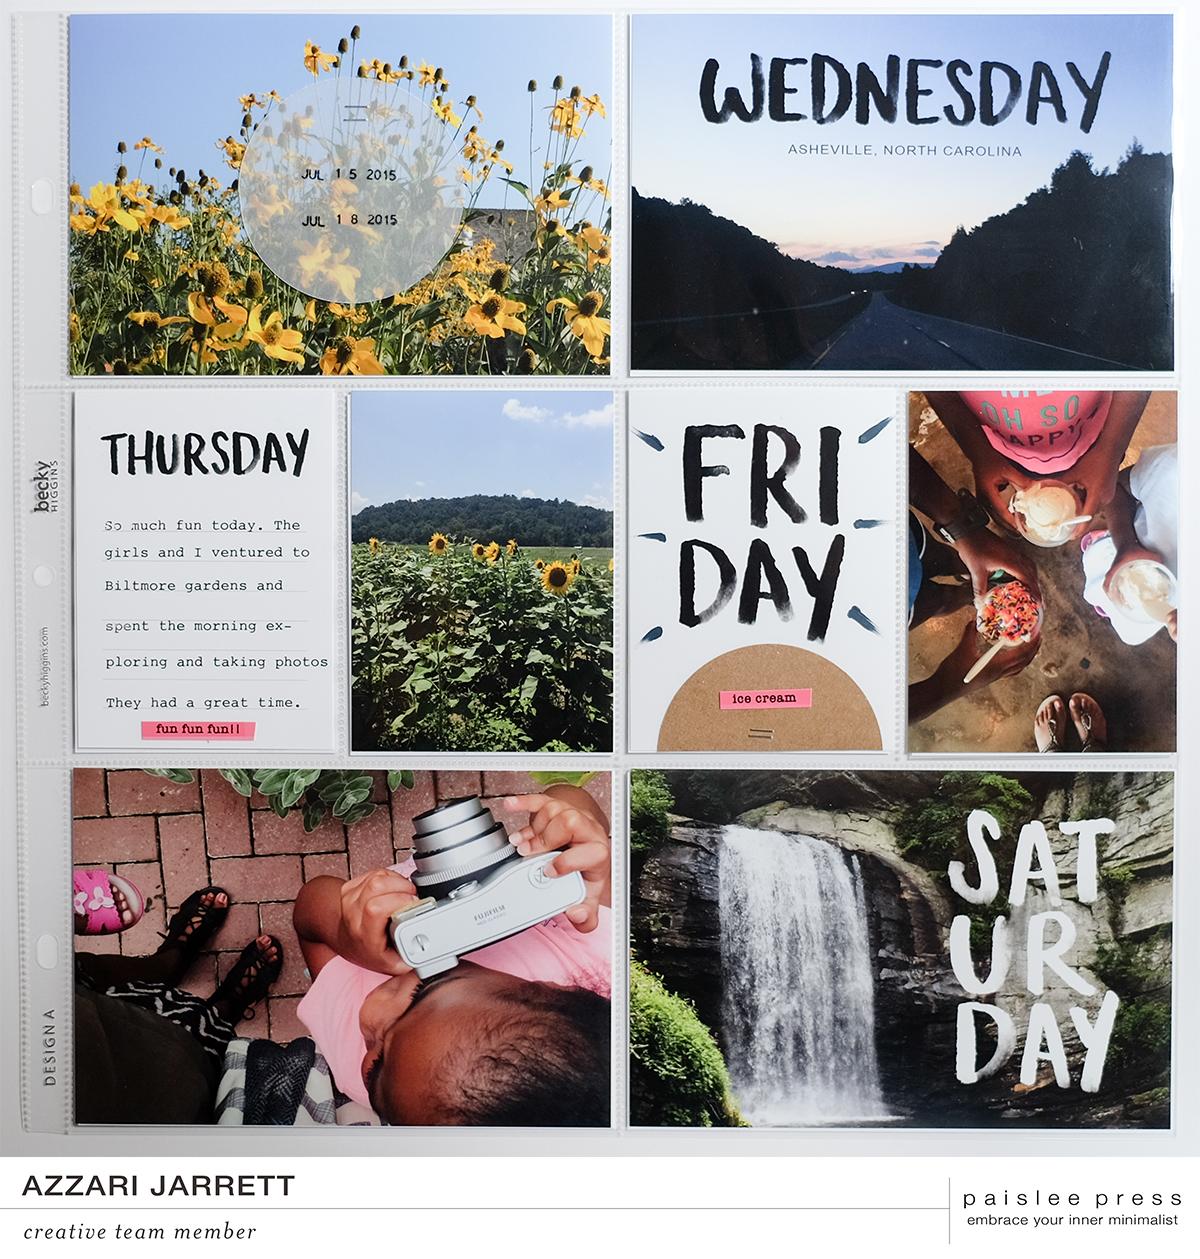 Paislee Press Days Project Life Layout by Azzari Jarrett